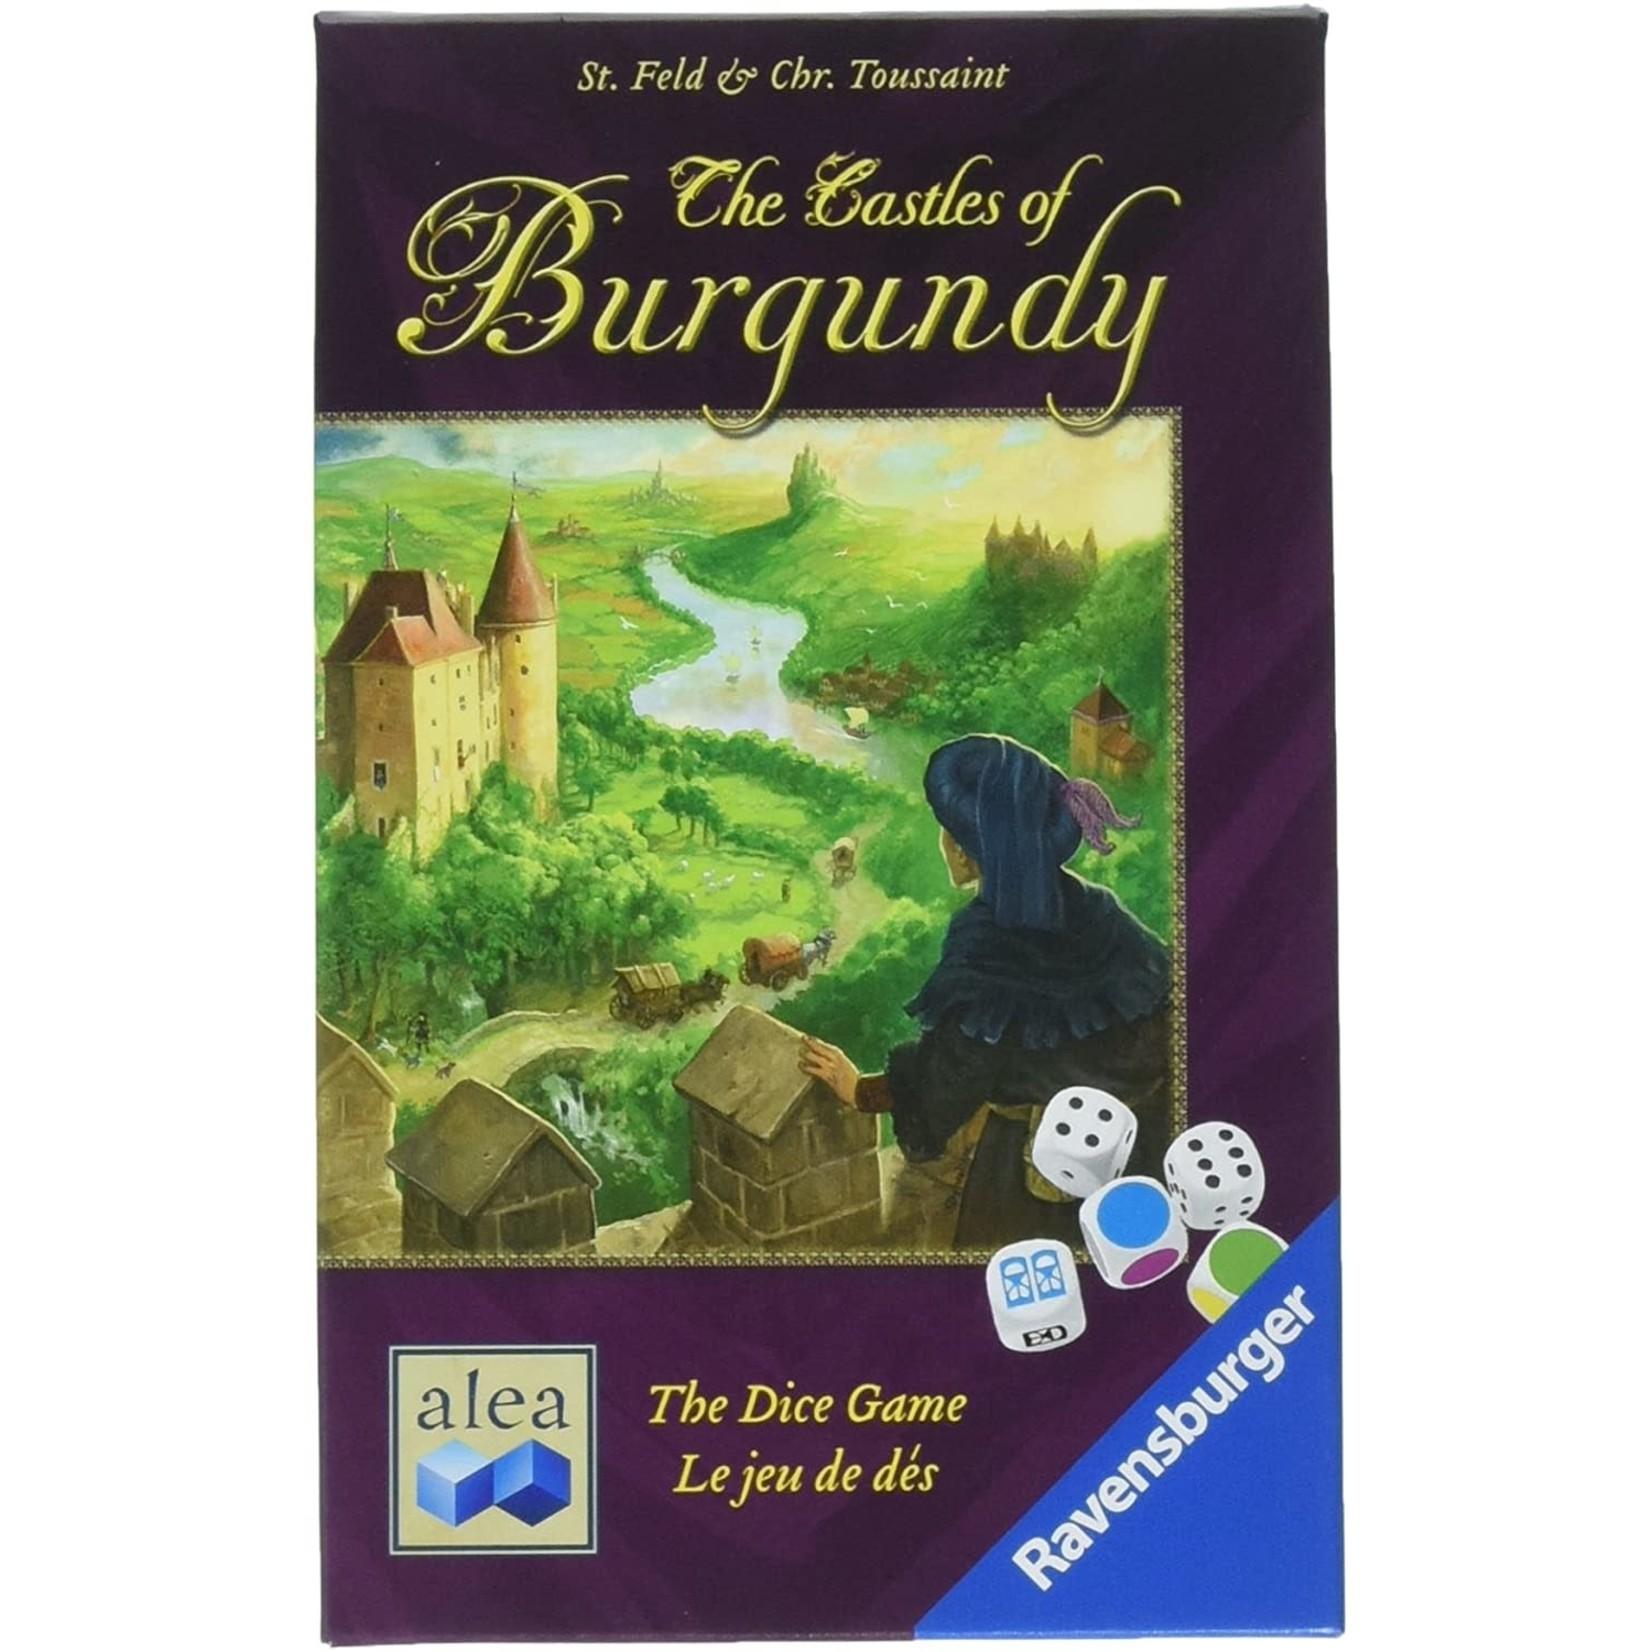 Castles of Burgundy Dice Games